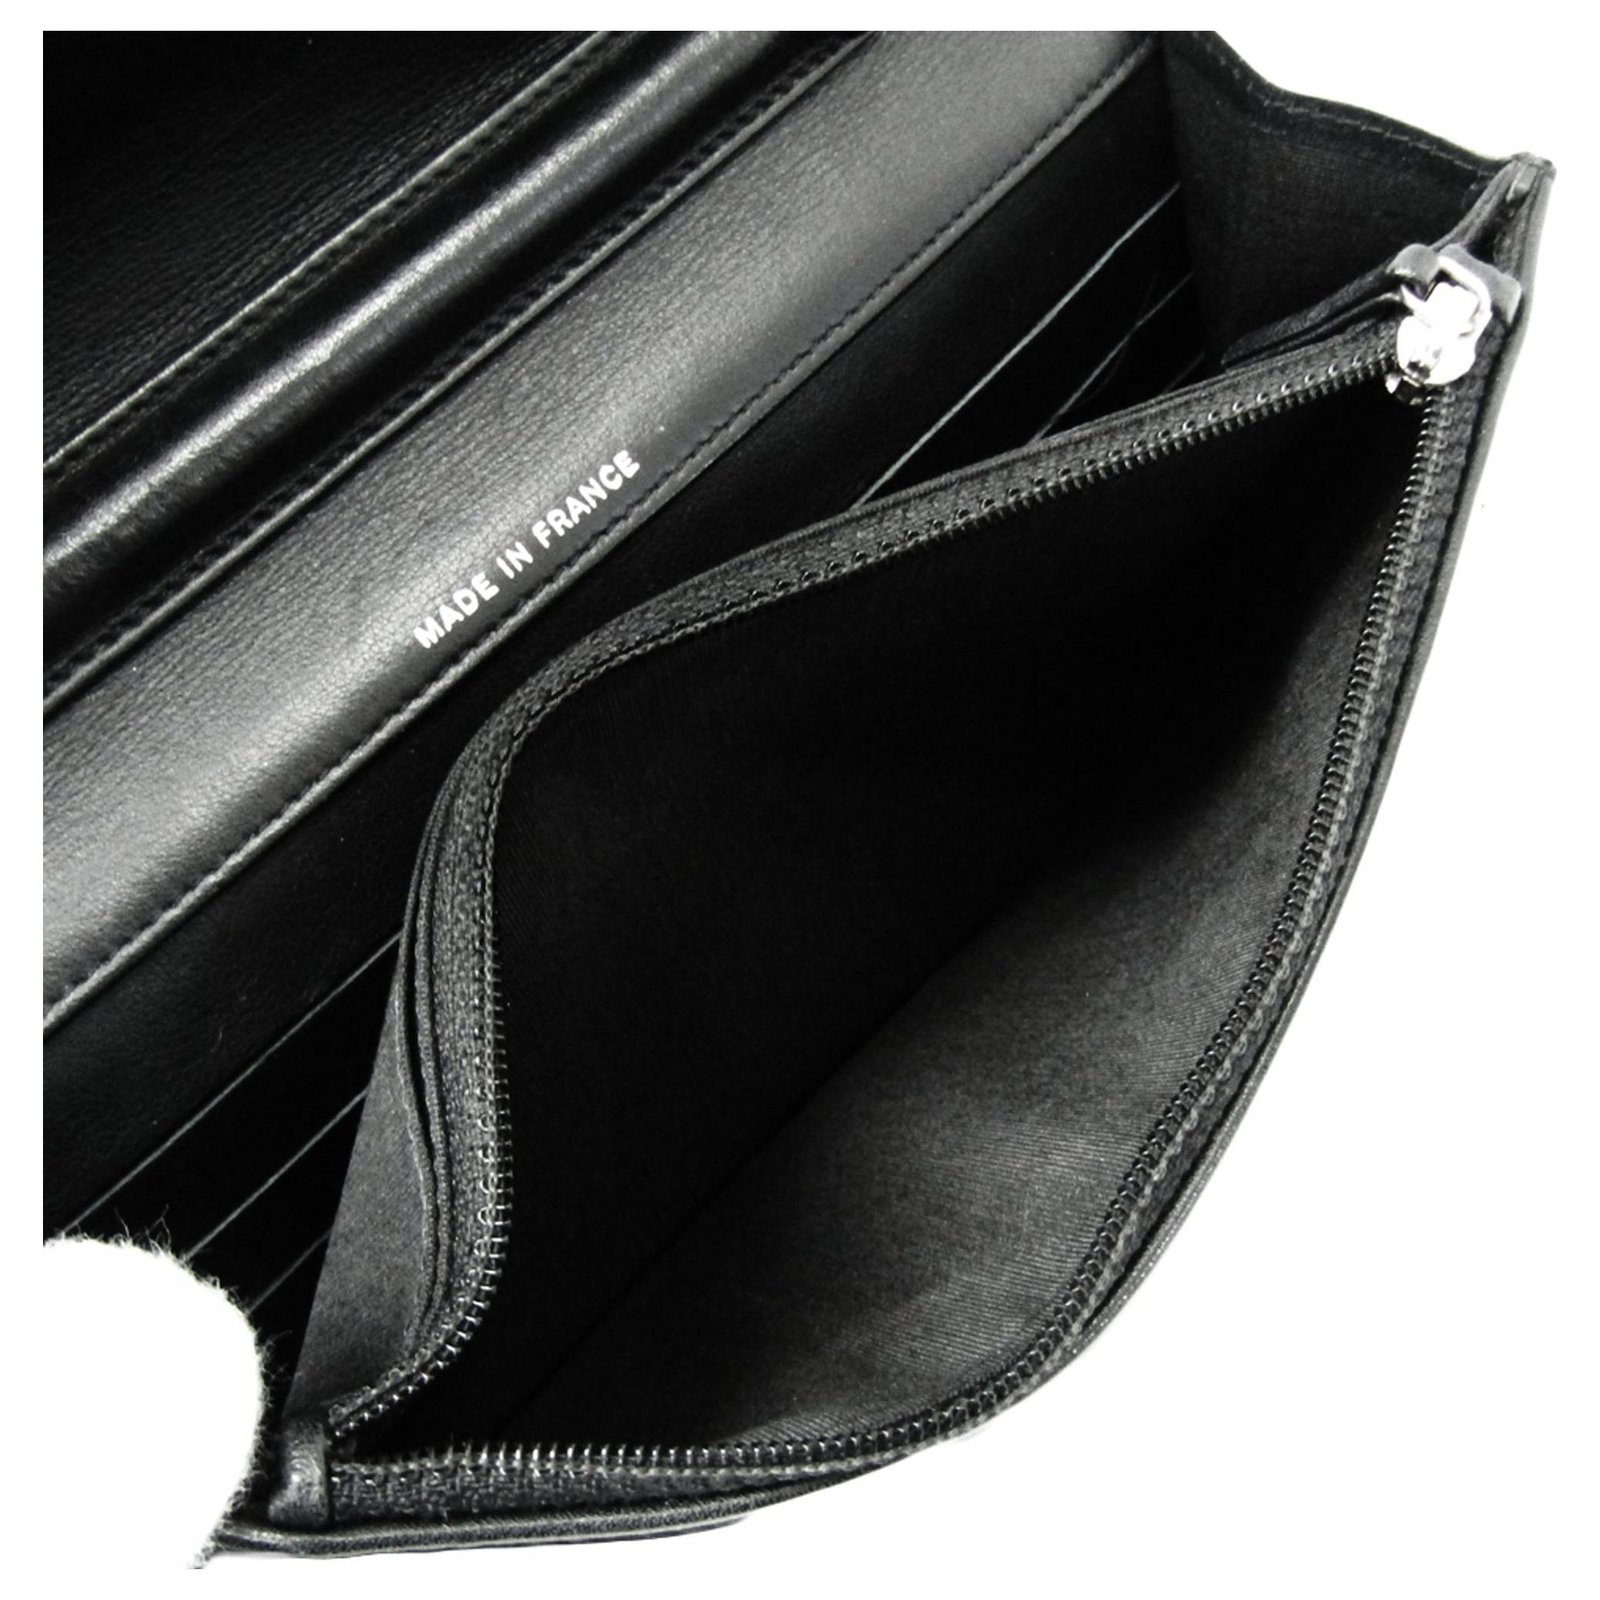 19ddd617d1c9e7 Chanel Chanel Black Patent Make-Up Line Wallet On Chain Handbags Leather,Patent  leather Black ref.128438 - Joli Closet